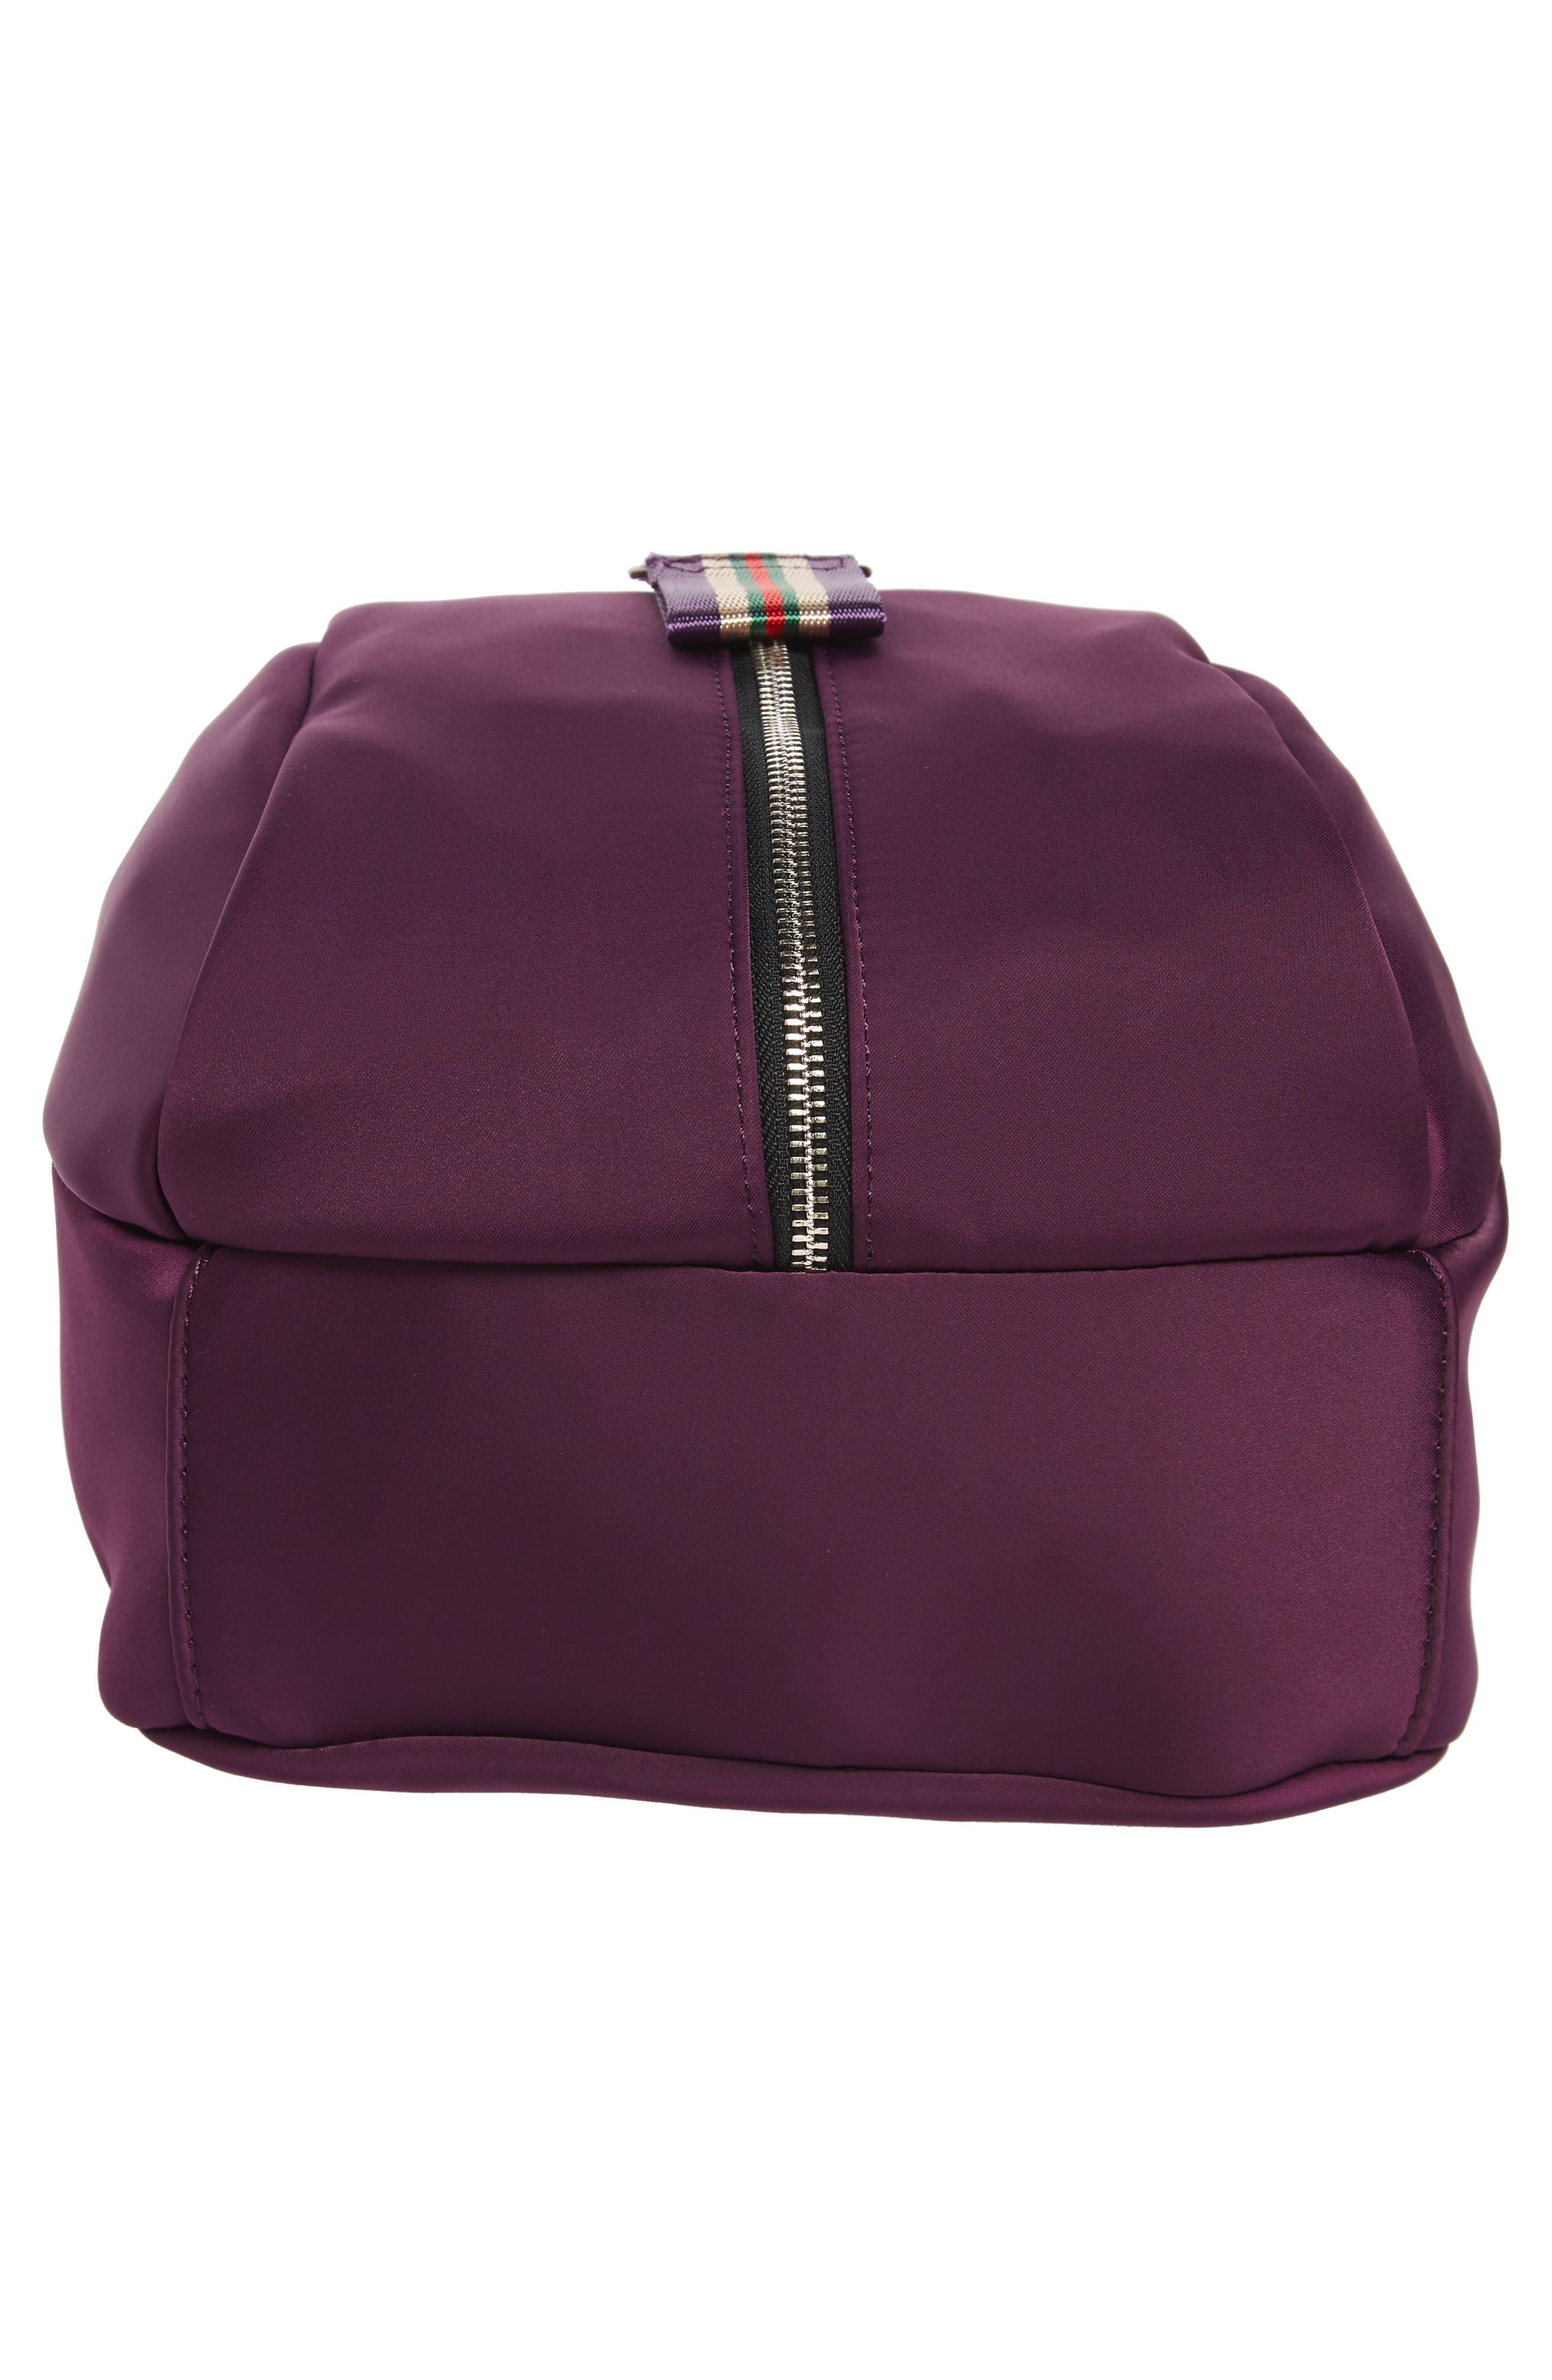 Satin Nylon & Webbing Convertible Backpack,                             Alternate thumbnail 5, color,                             PURPLE